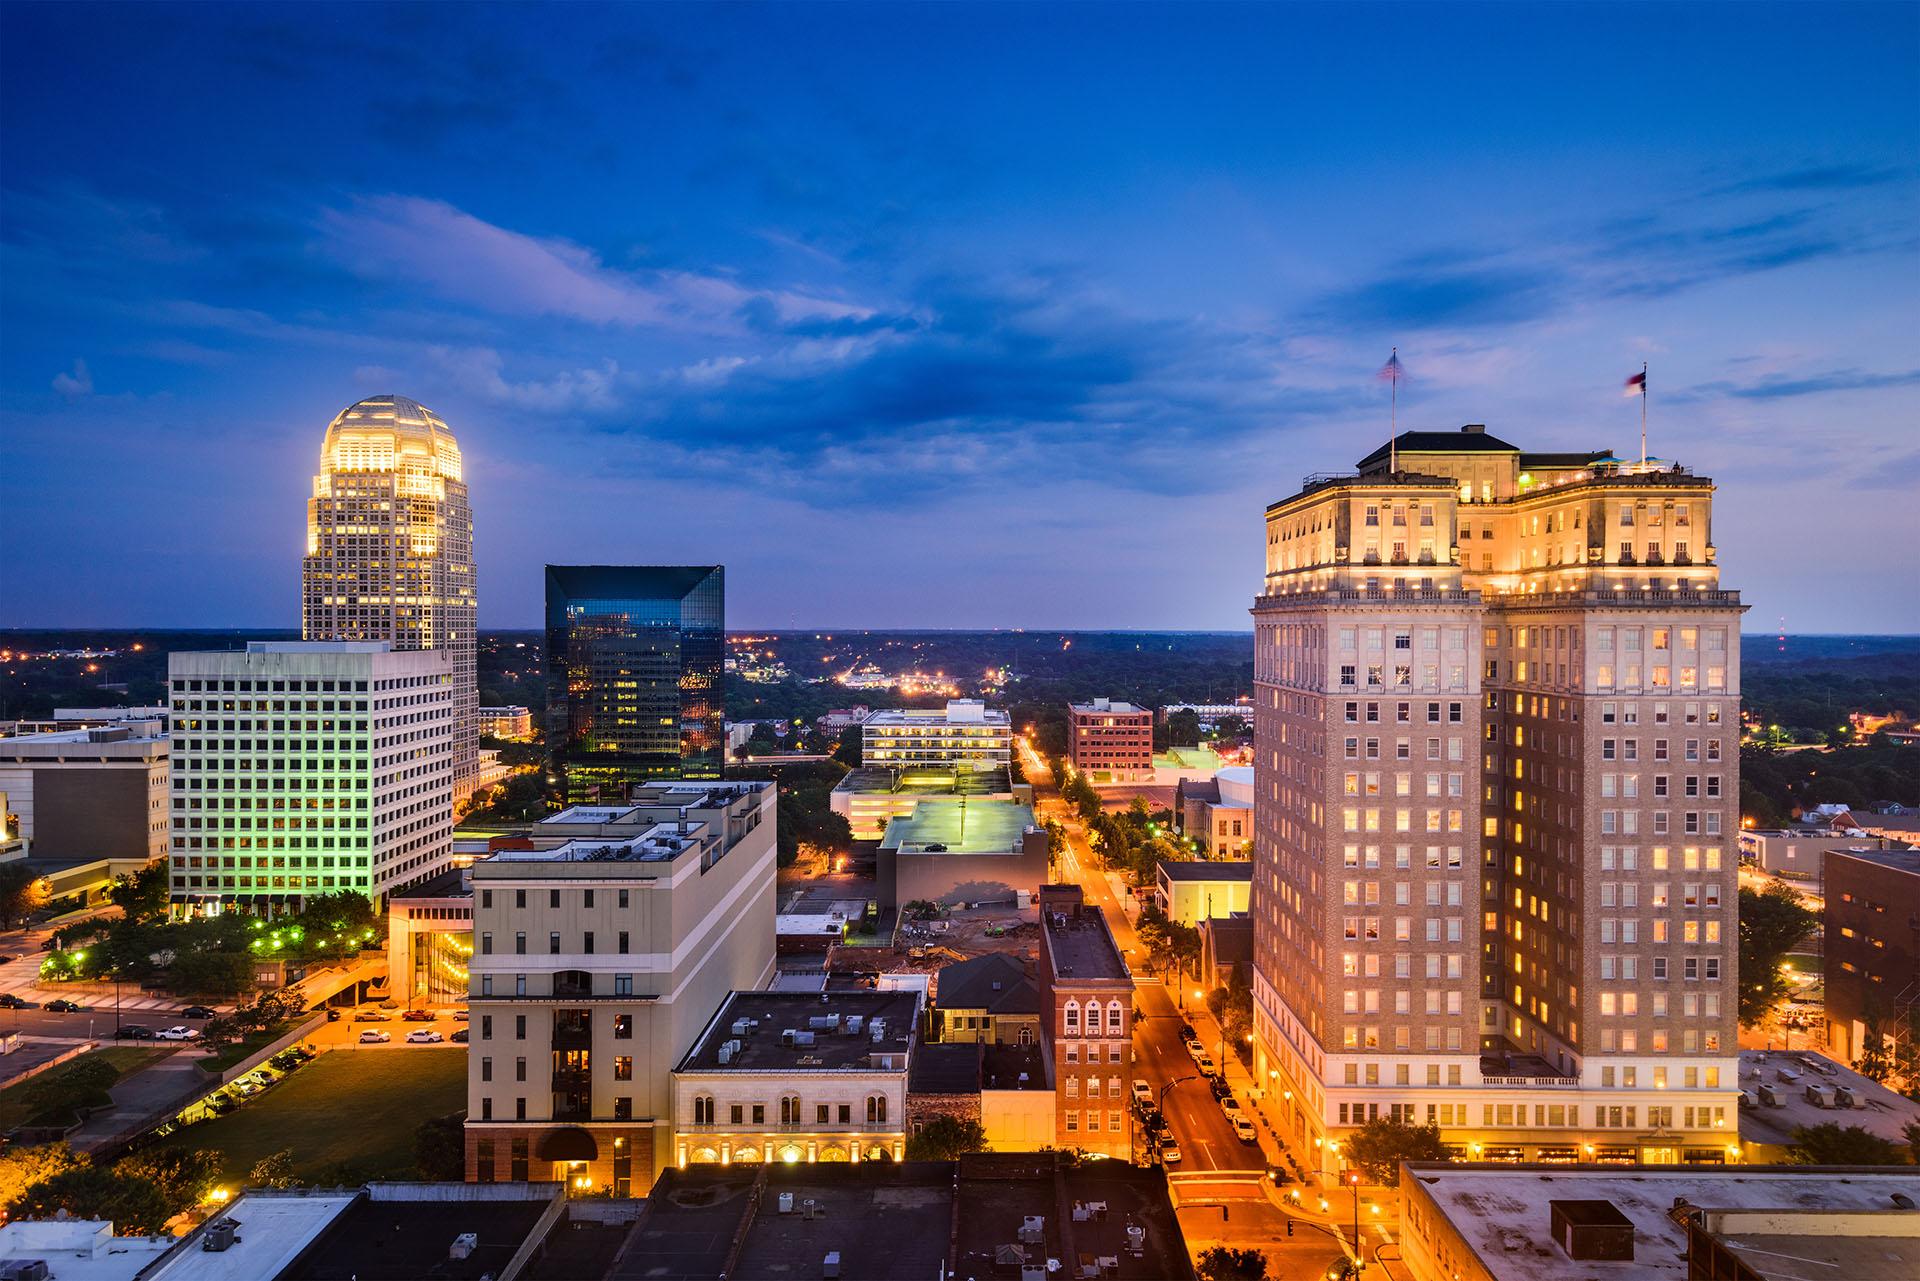 winston-salem financial advisor - Parsec Financial Planning - Fee Only Financial Advisor in Asheville NC Charlotte NC